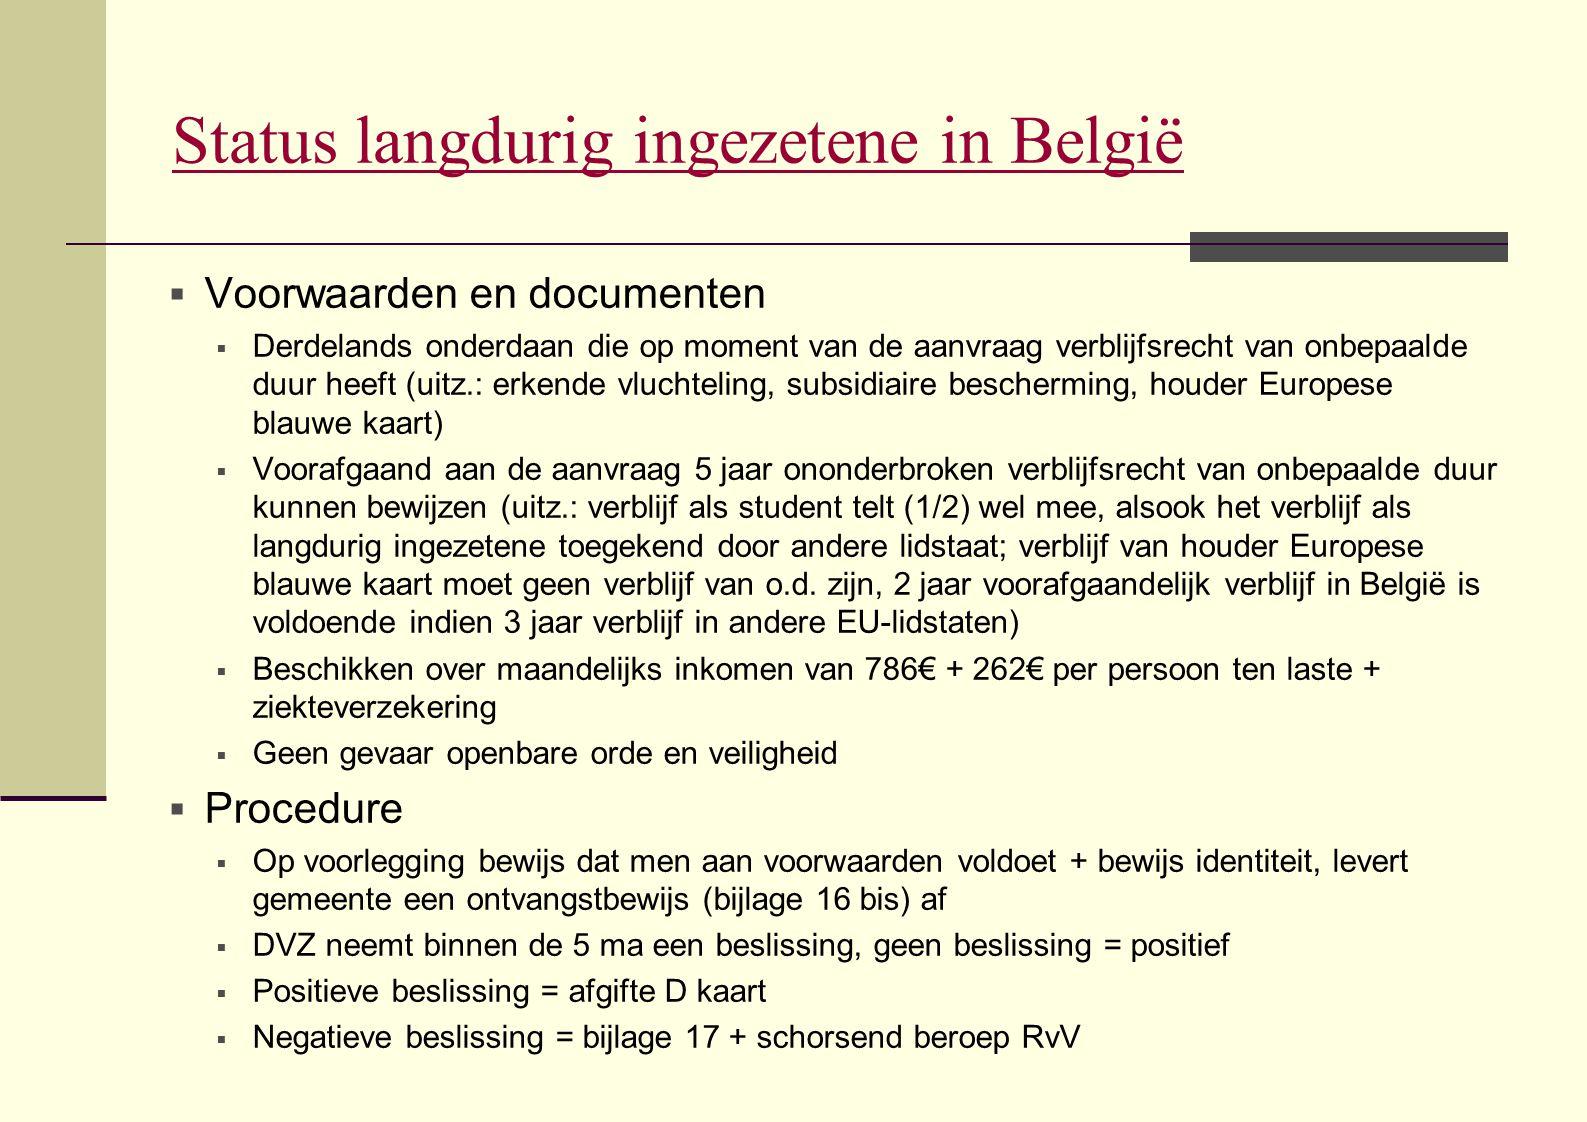 Status langdurig ingezetene in België